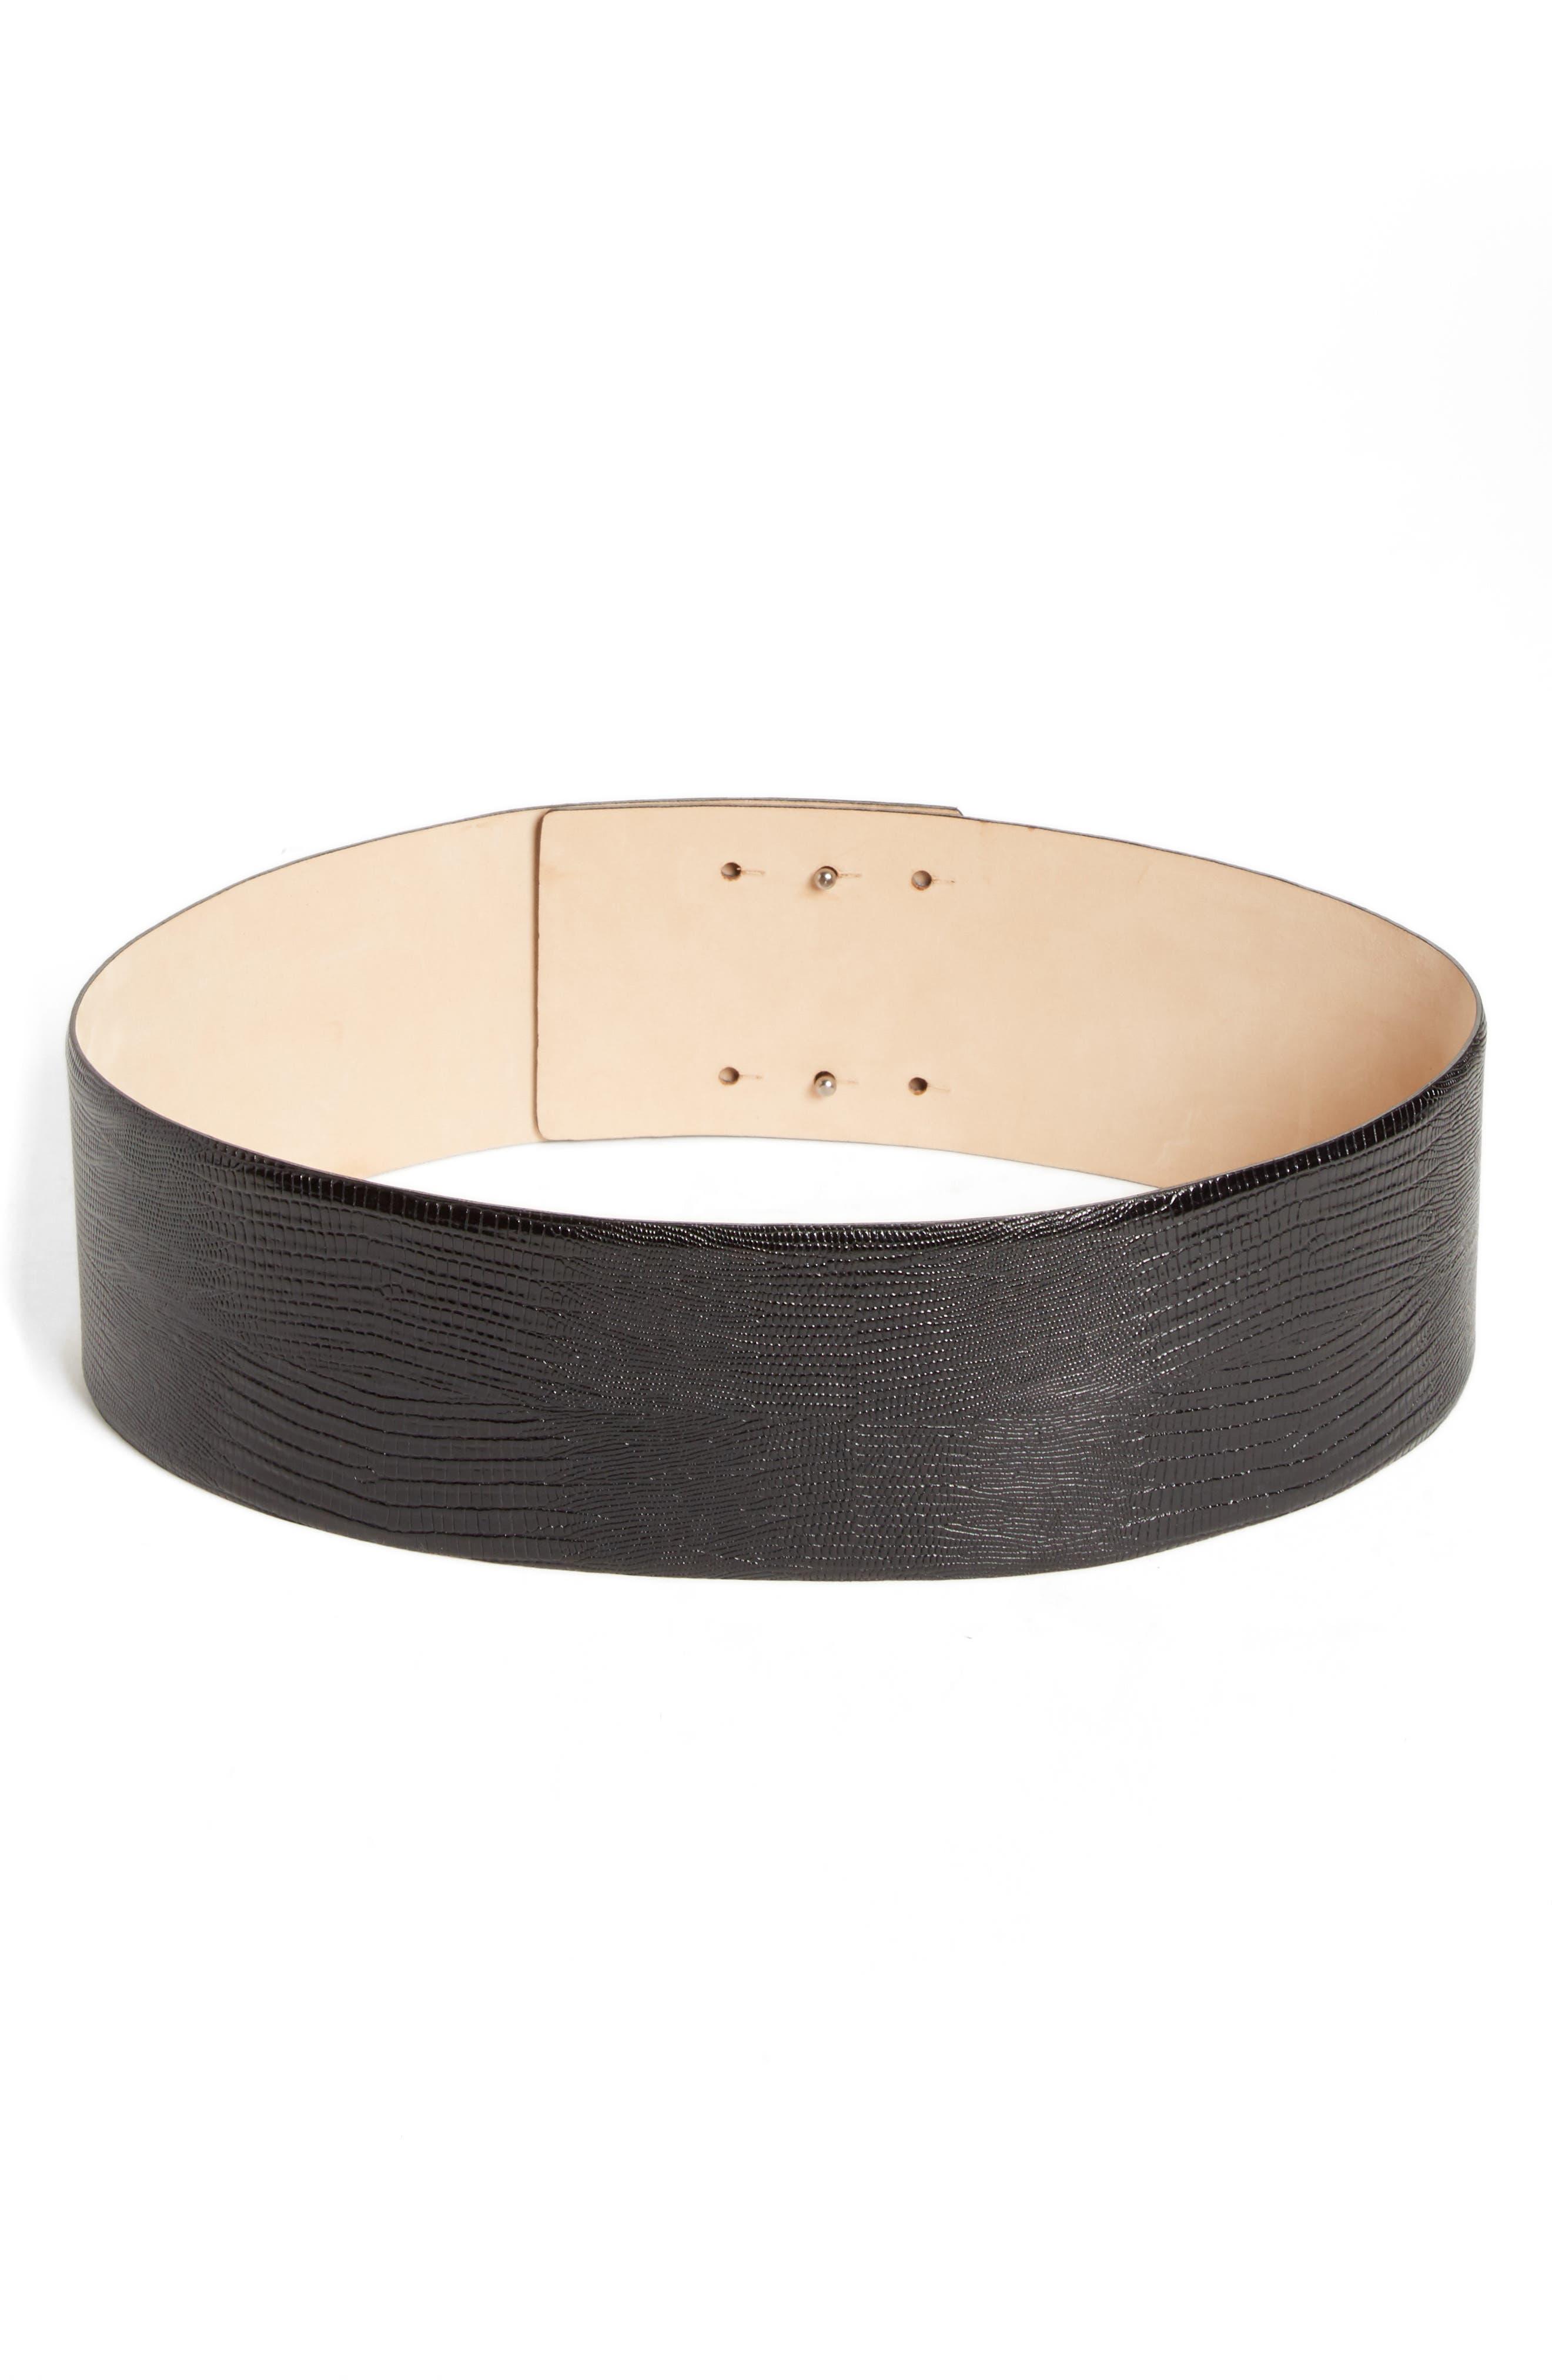 Max Mara Reptile Embossed Leather Belt